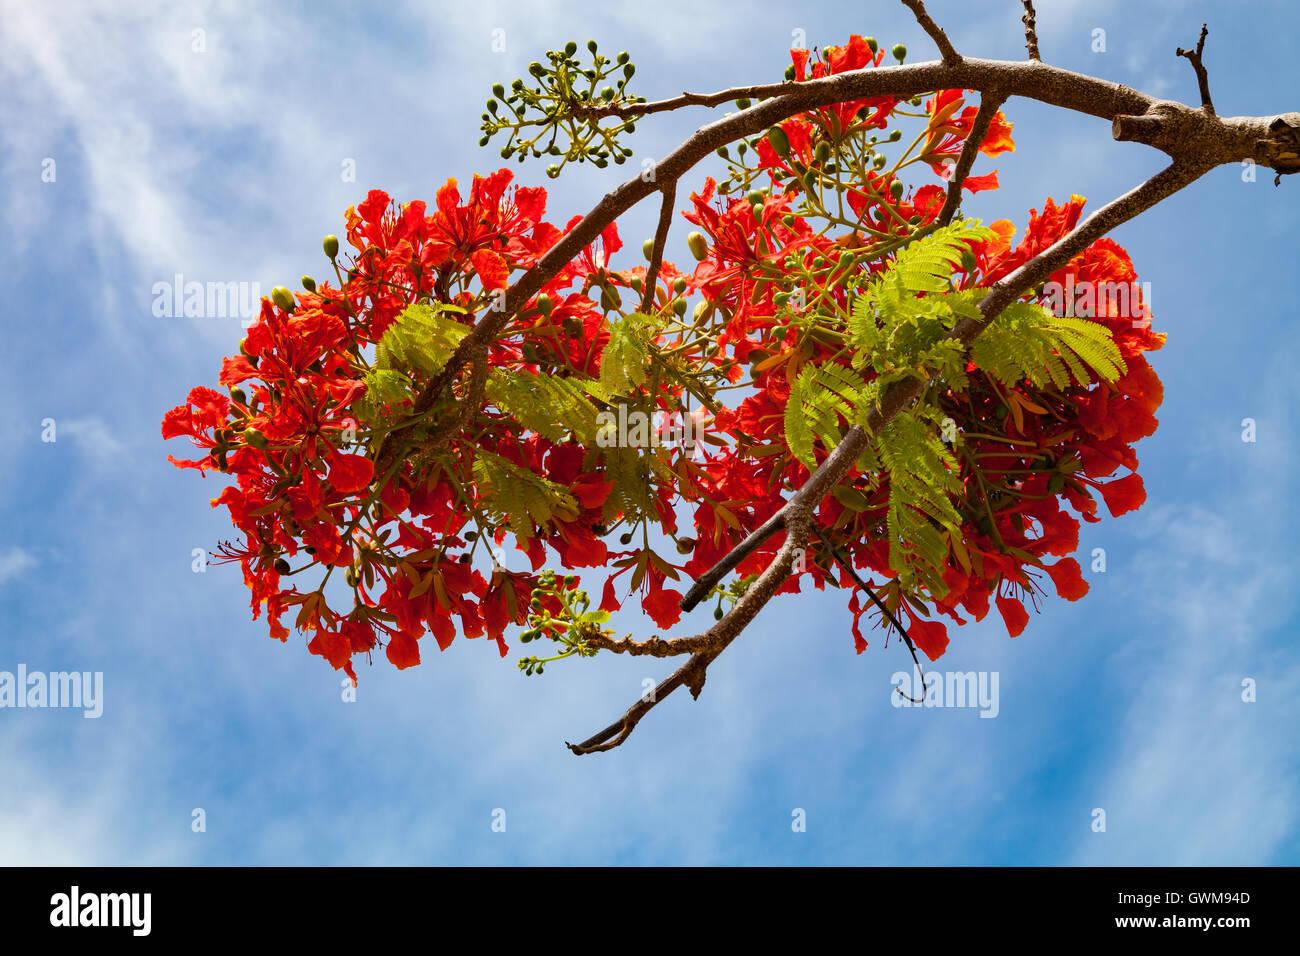 Royal Poinciana Or Famboyant Tree in  Antigua, Antigua and Barbuda - Stock Image